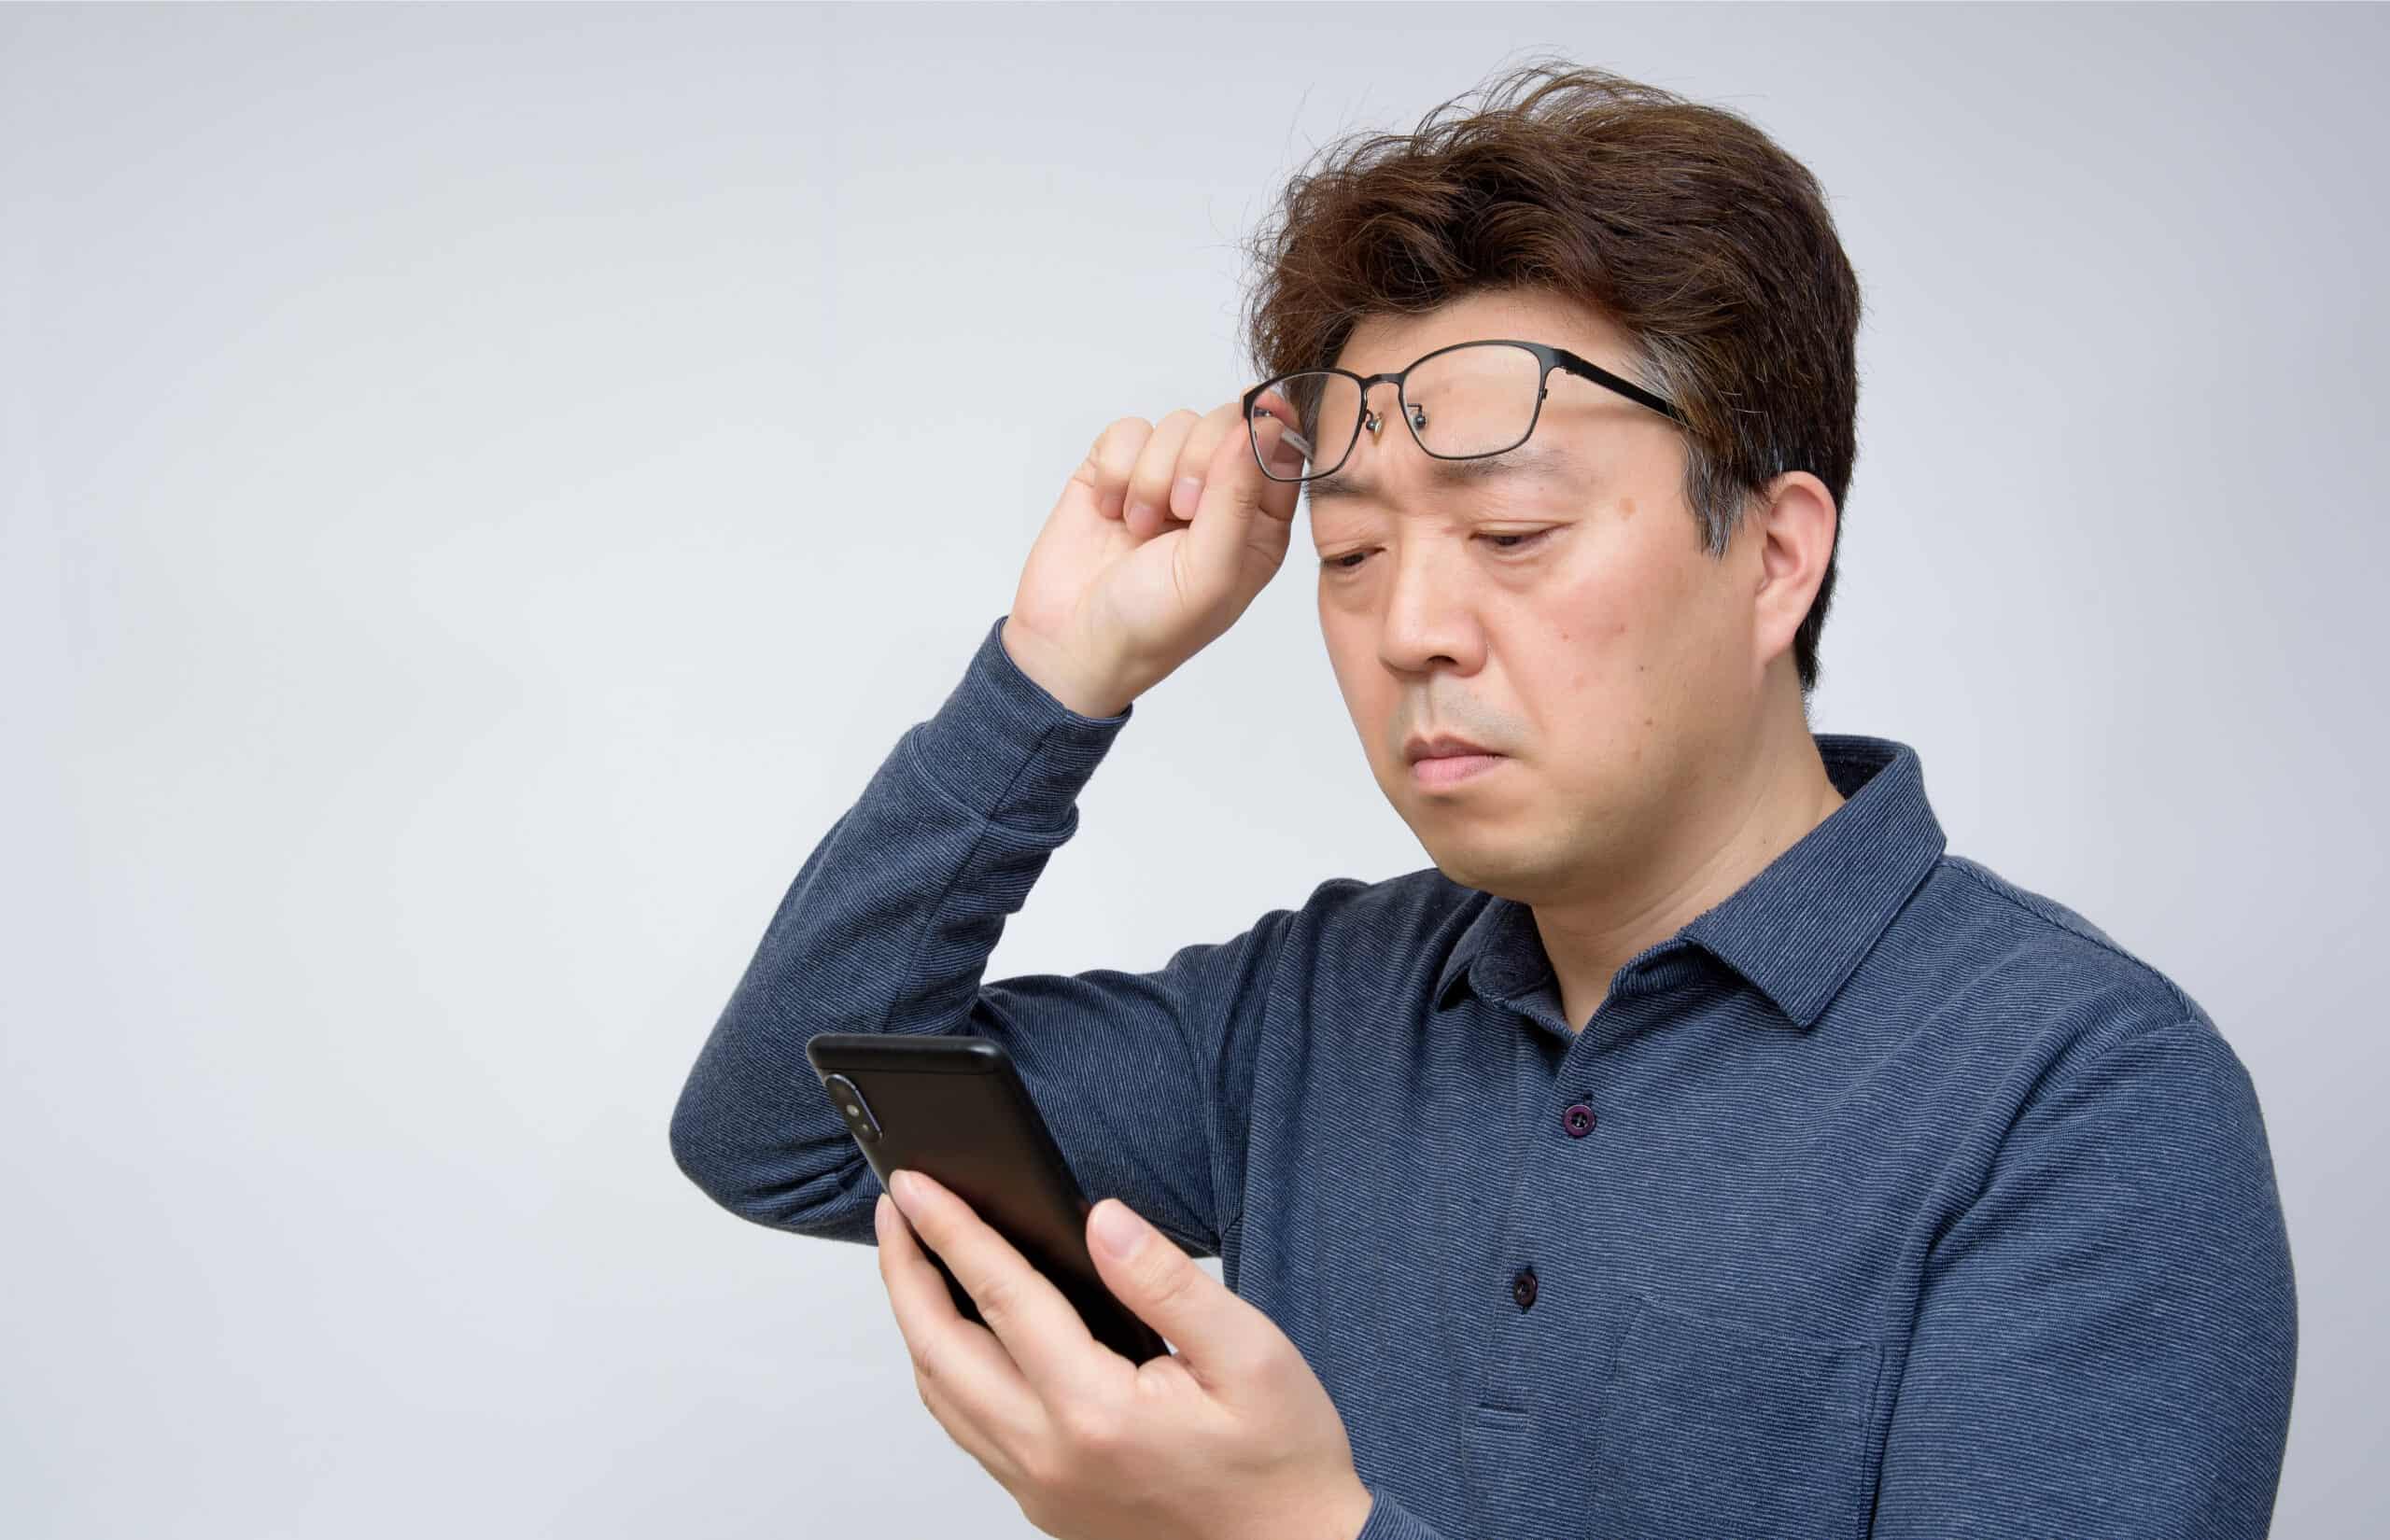 Presbyopia Symptoms and Trouble Reading